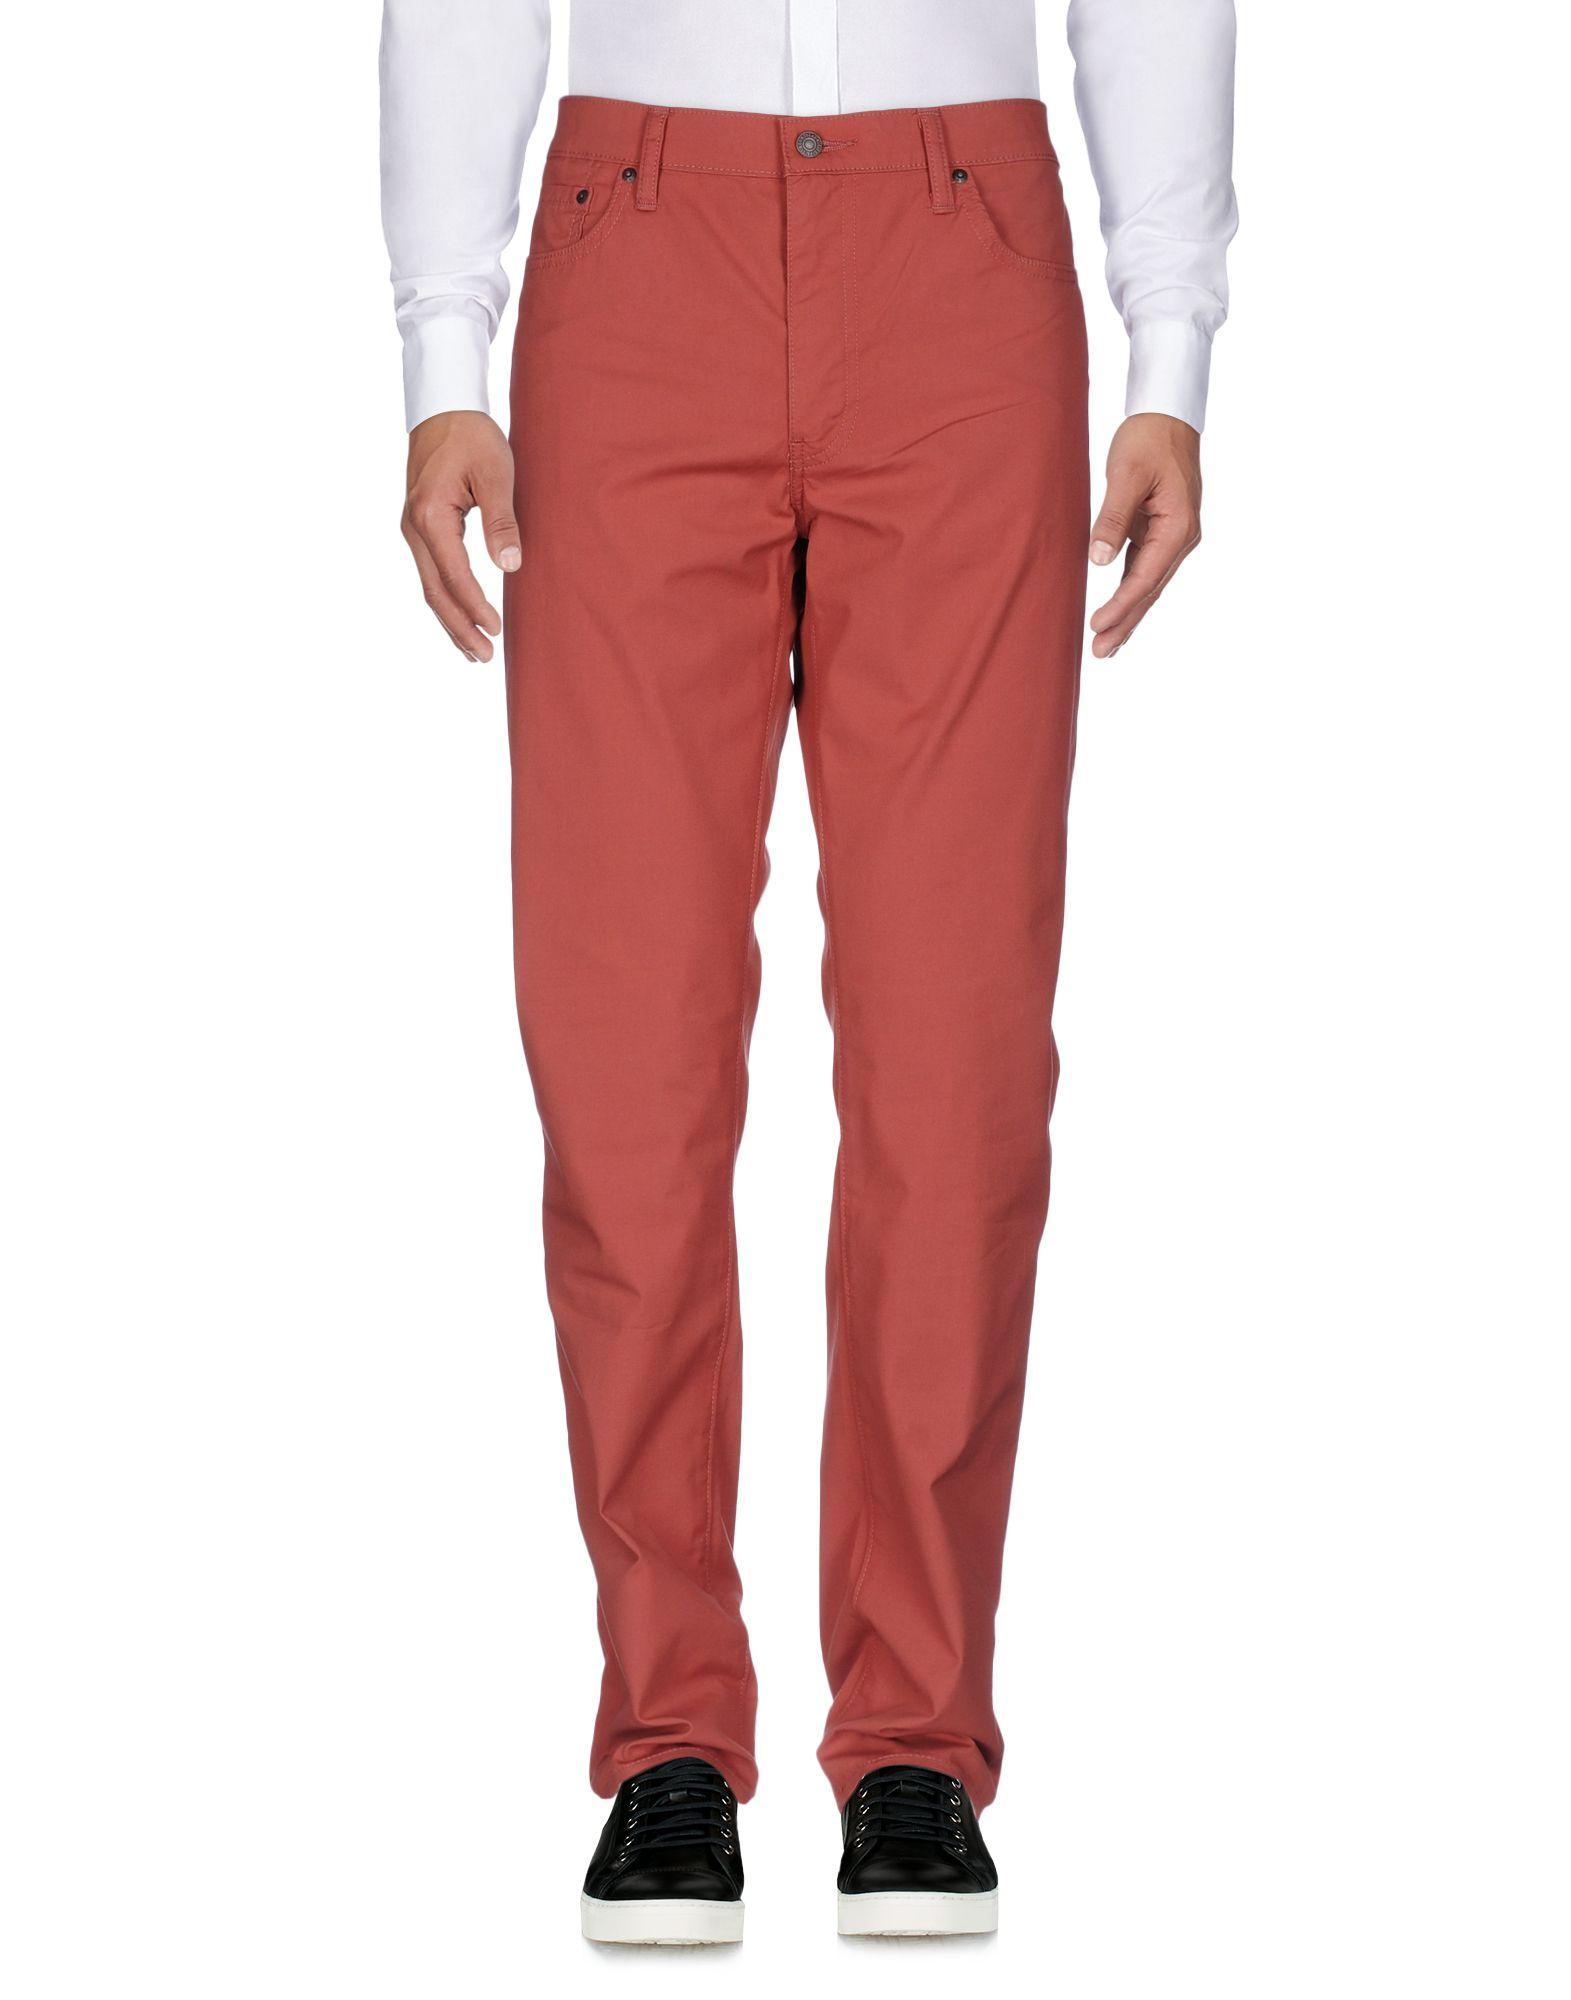 ФОТО levi's red tab повседневные брюки